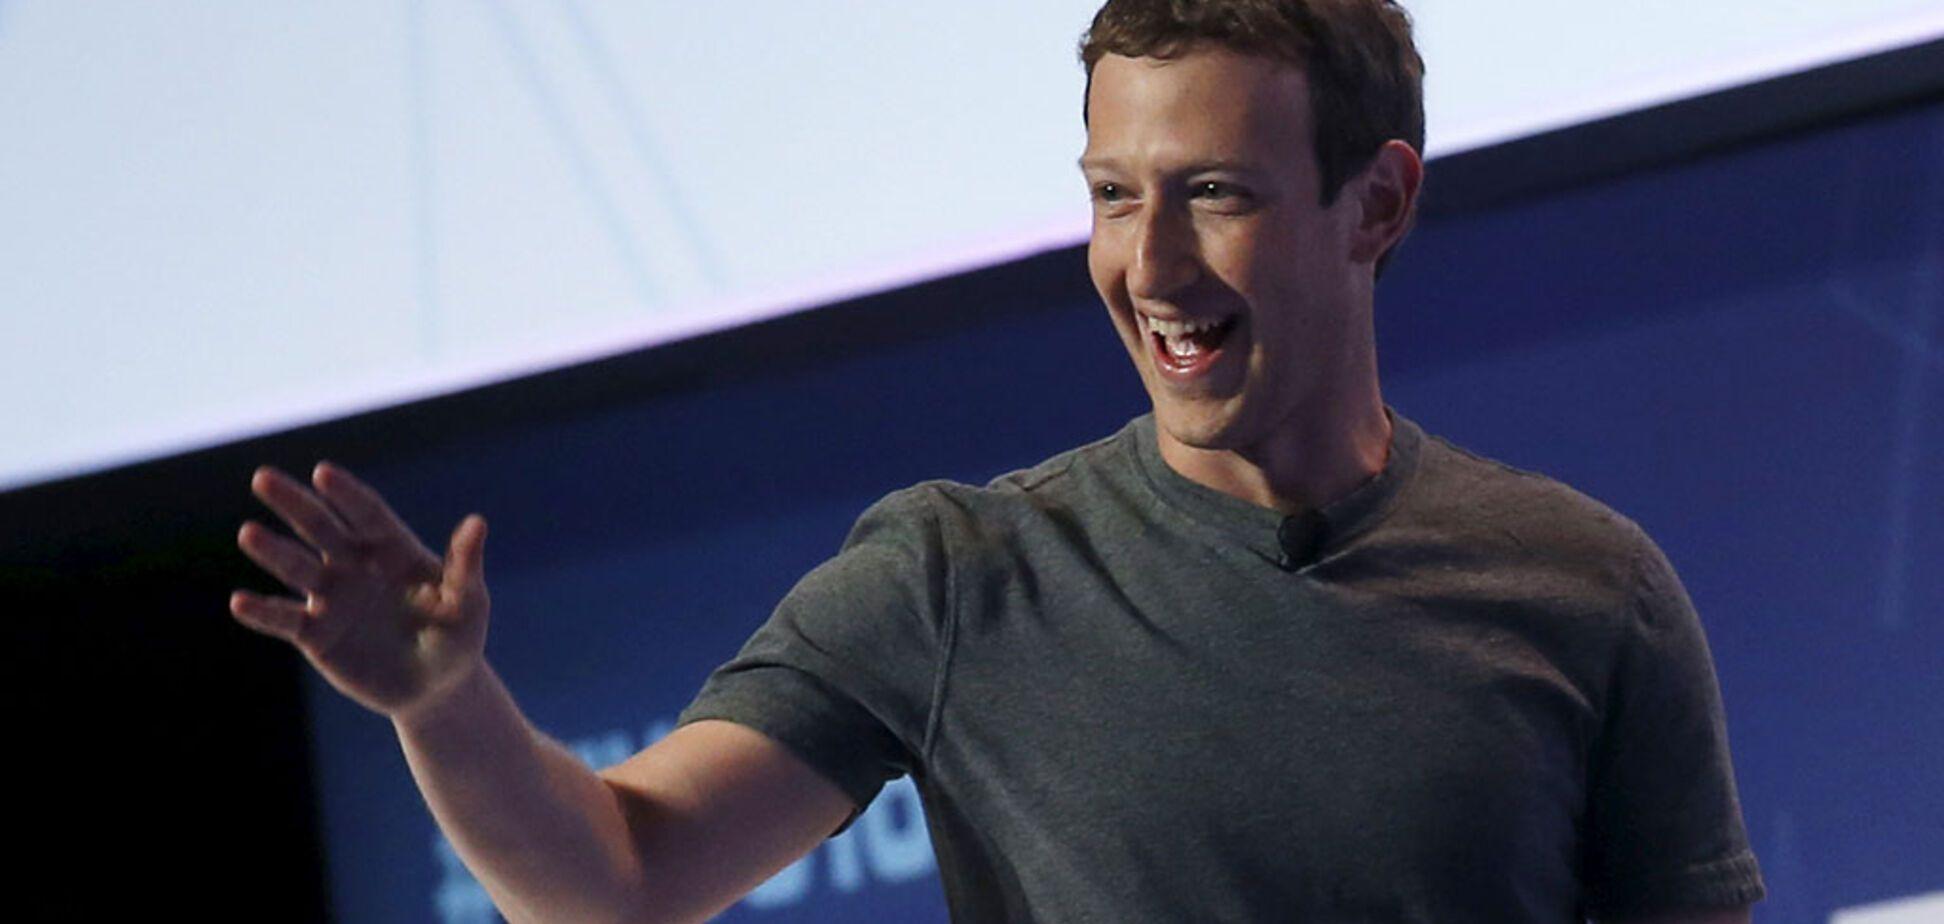 Станет ли Цукерберг президентом США?